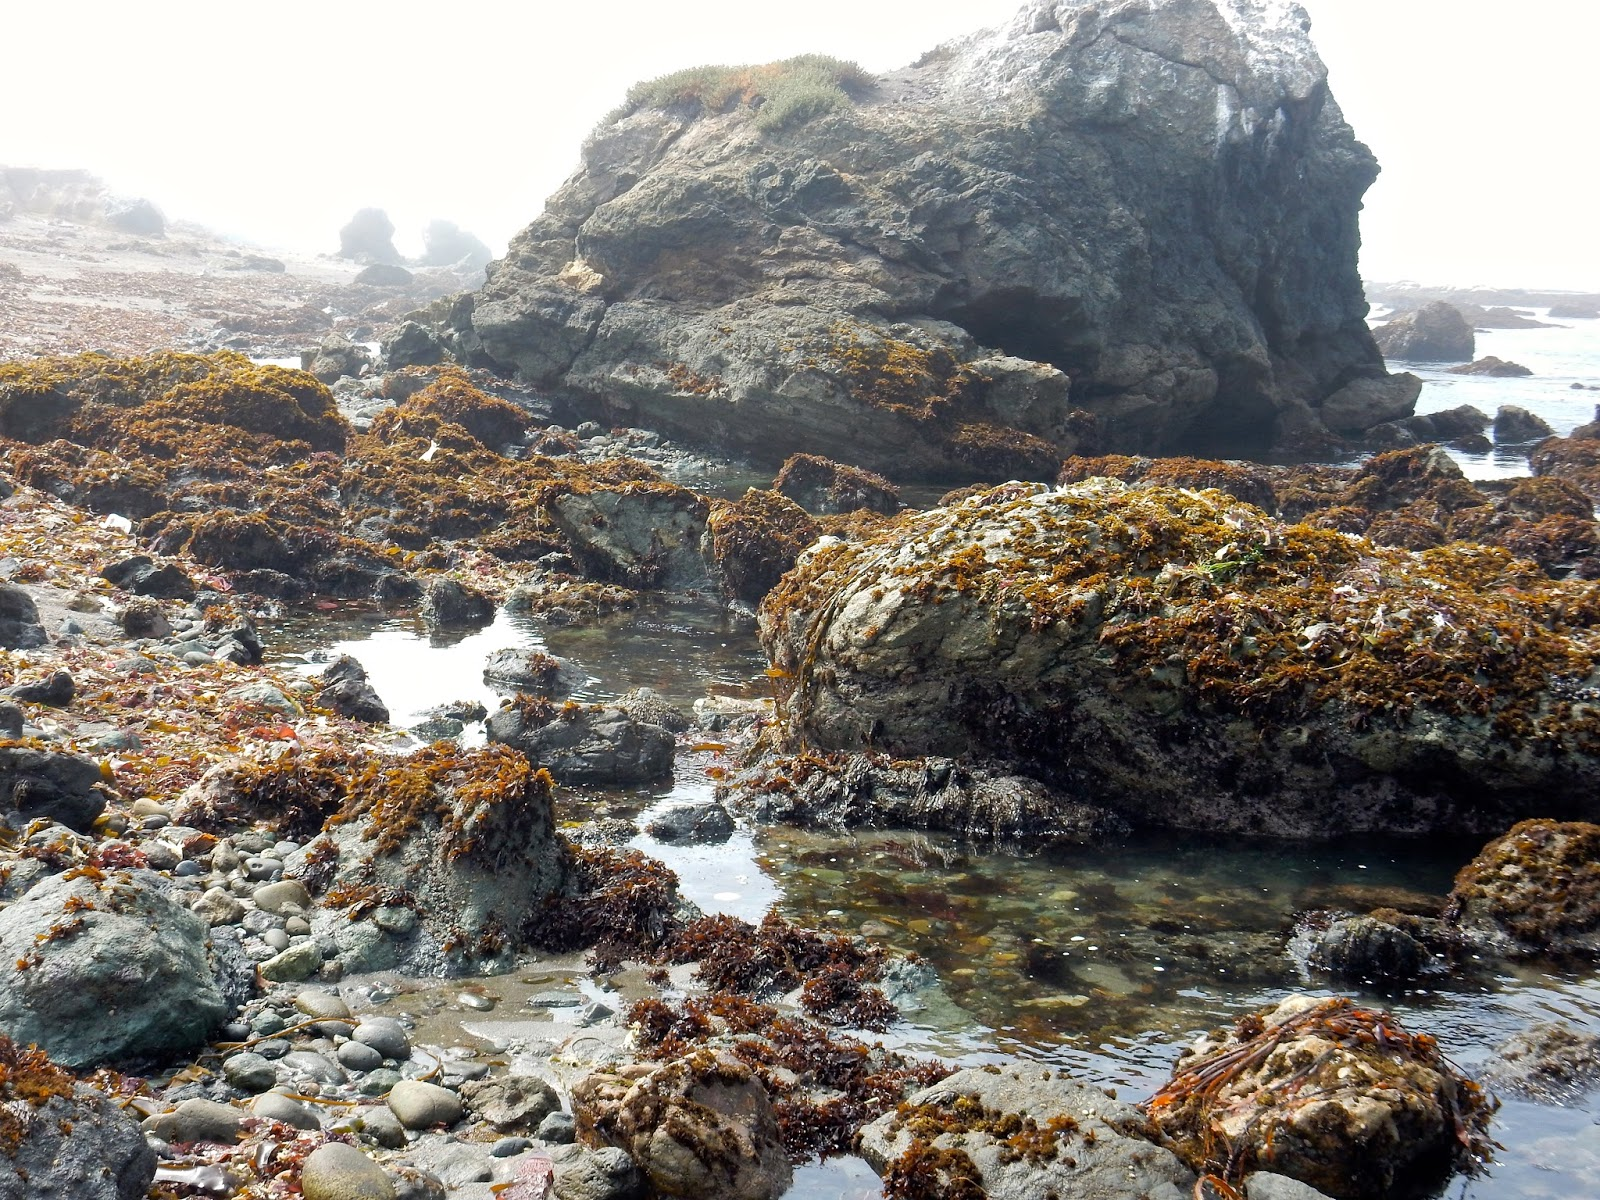 oregon tide pool identification - Google Search | Rock ...  |Pacific Northwest Tide Pool